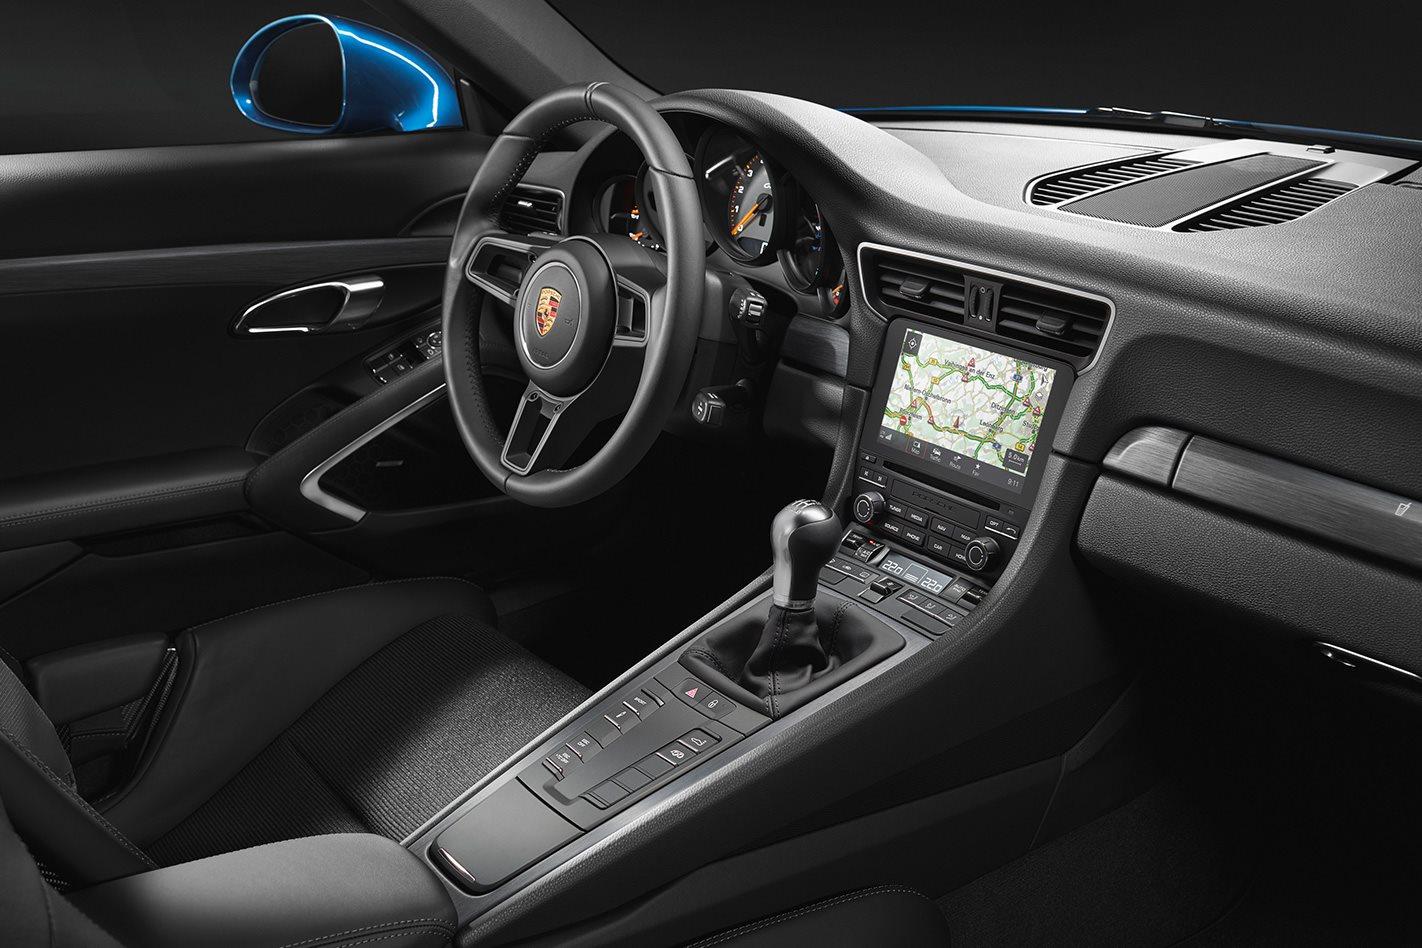 2018 Porsche 911 GT3 Touring interior